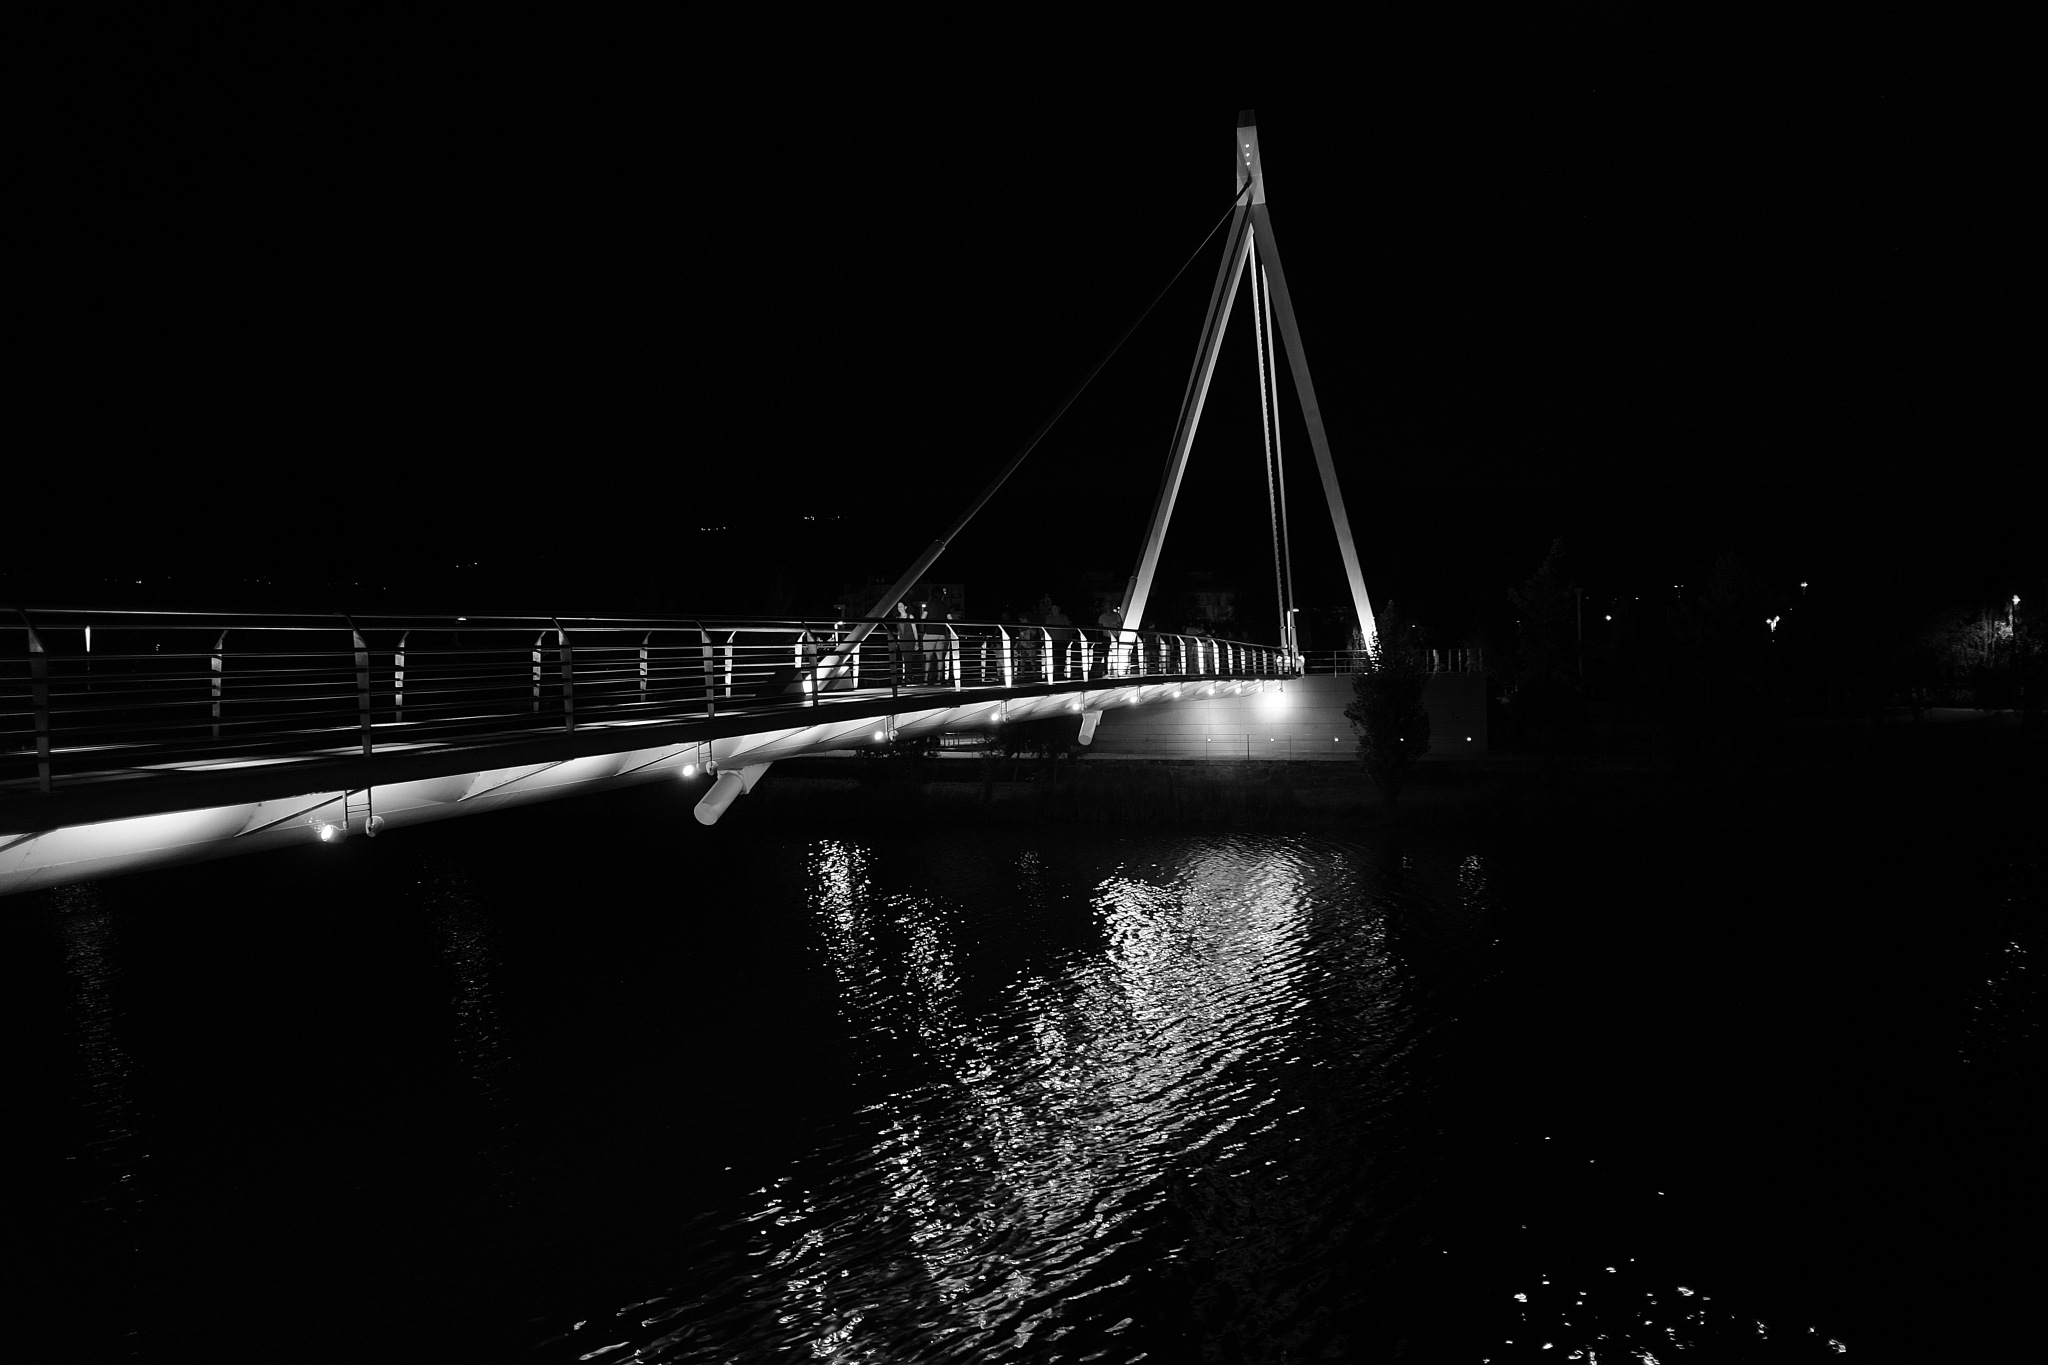 Night bridge by fernando.viegas